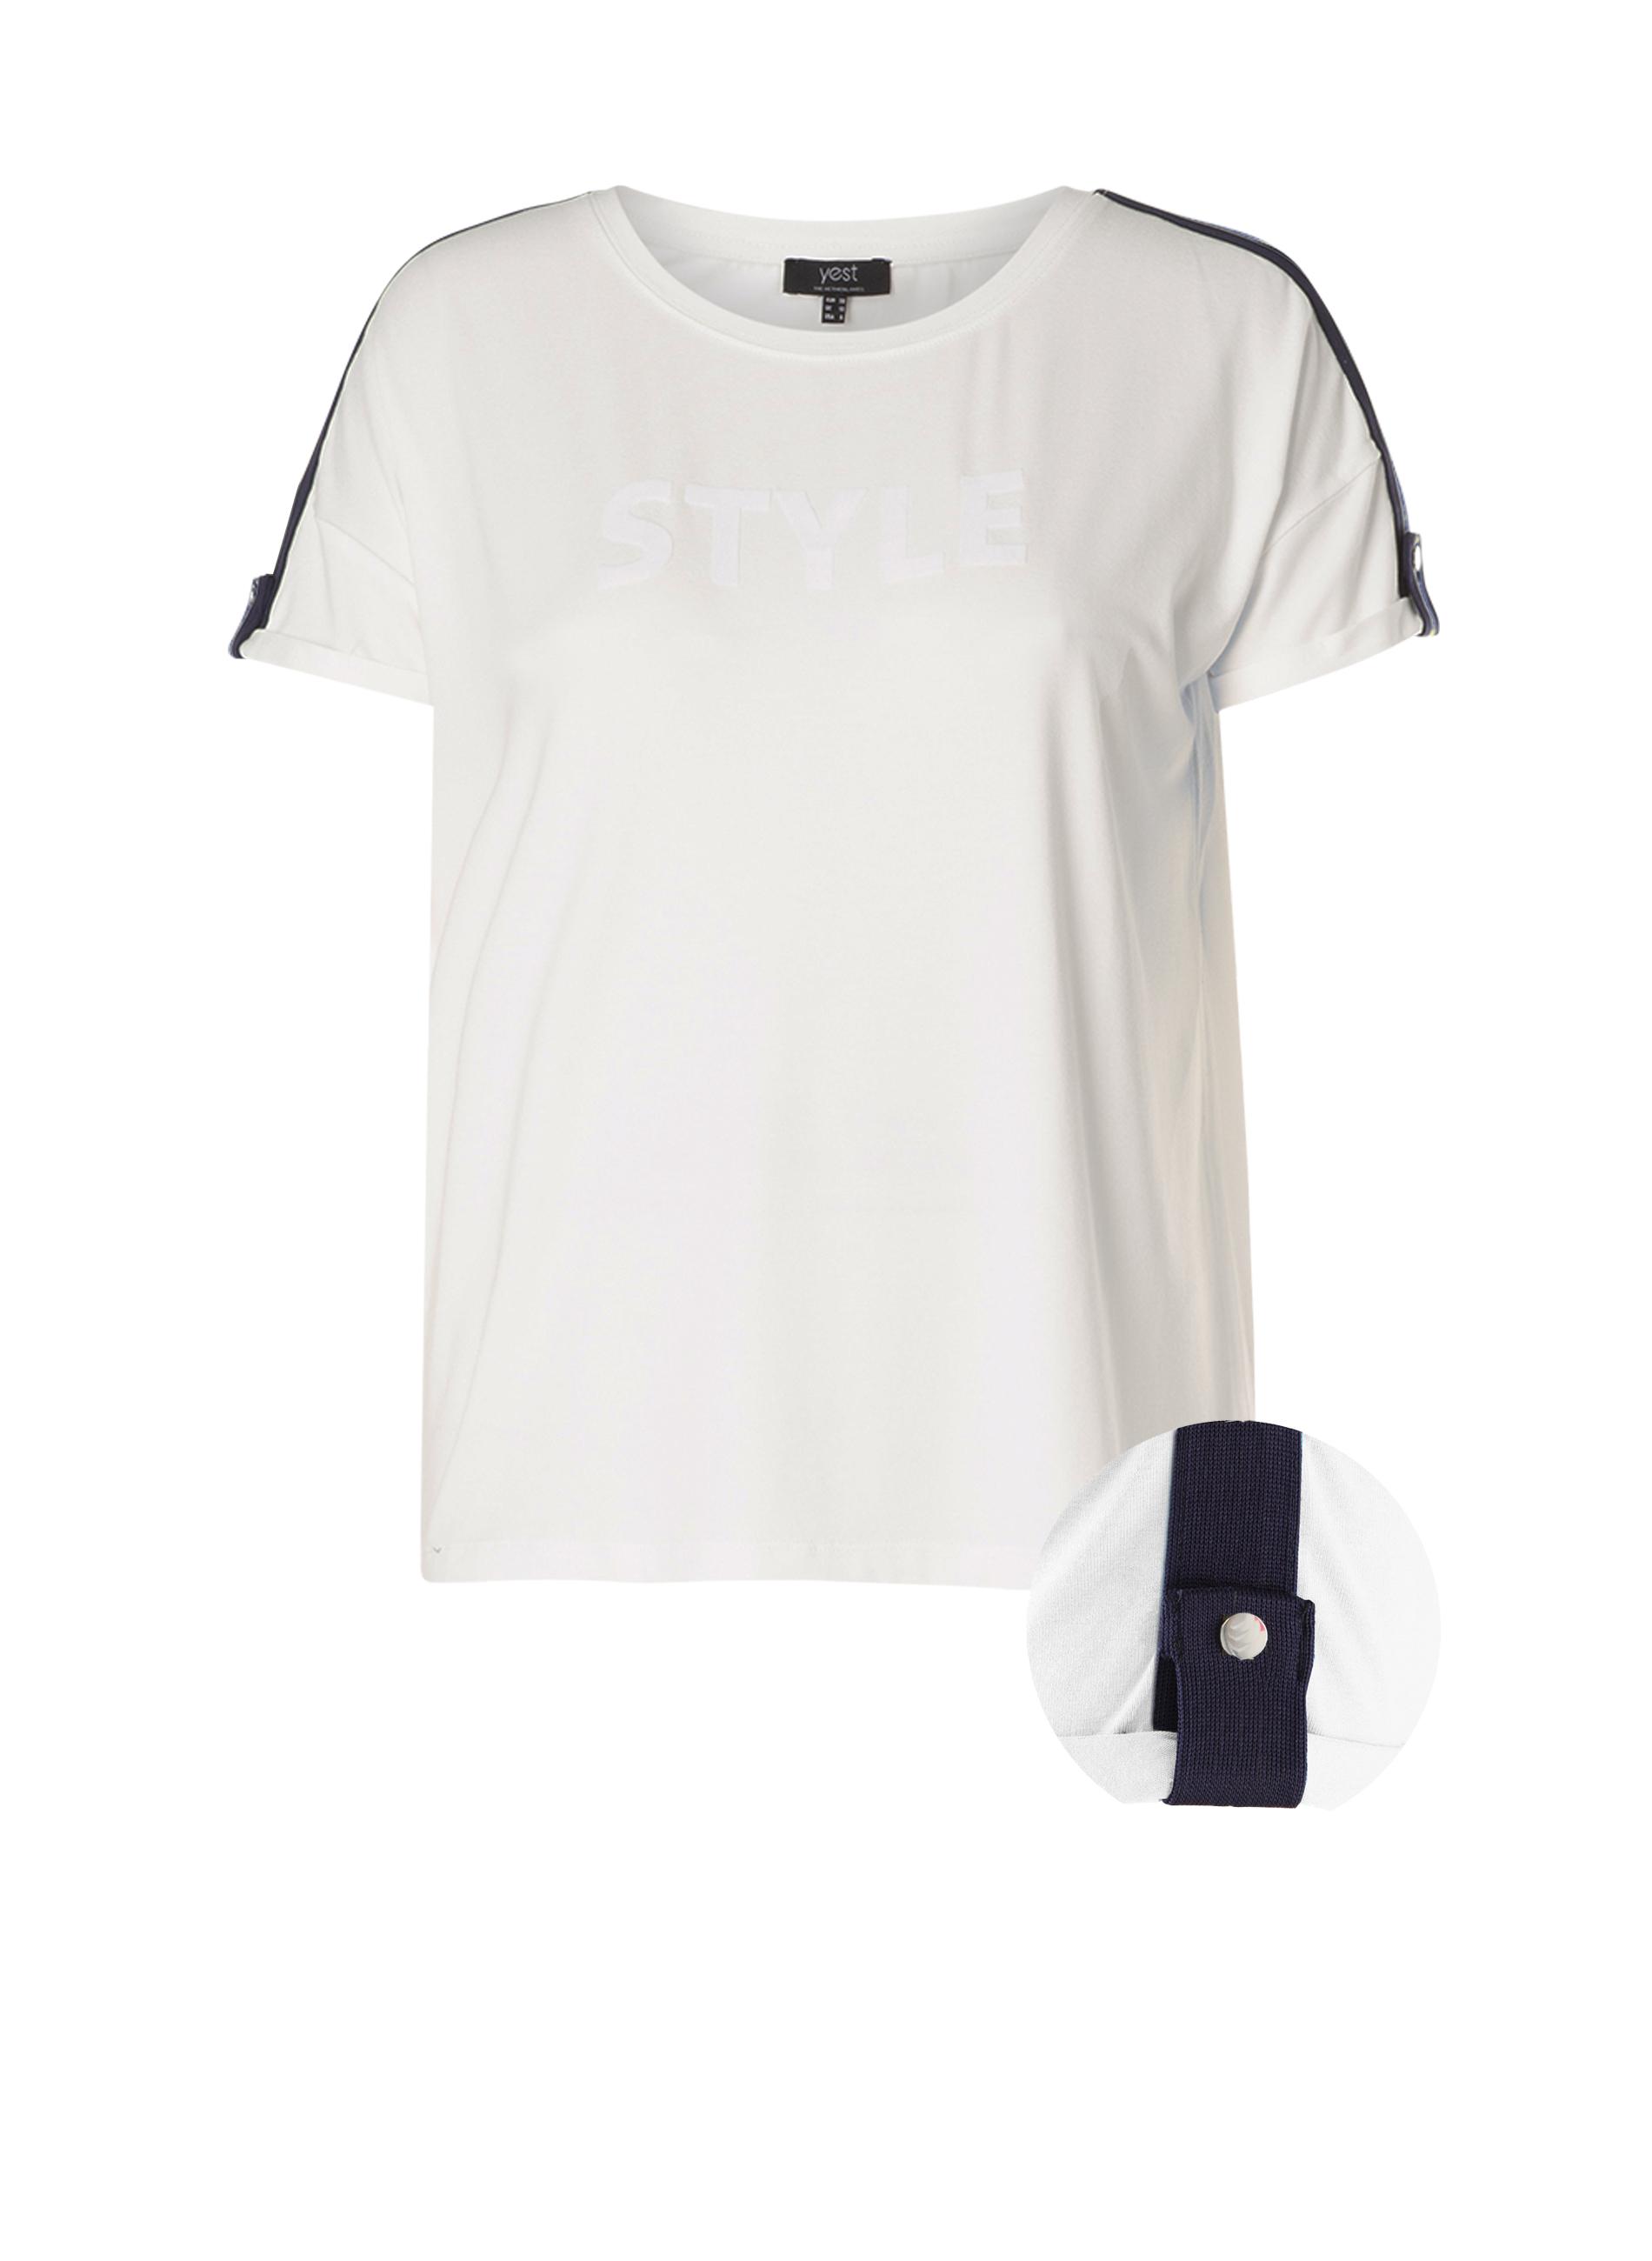 Shirt Harmke 76 cm Yesta